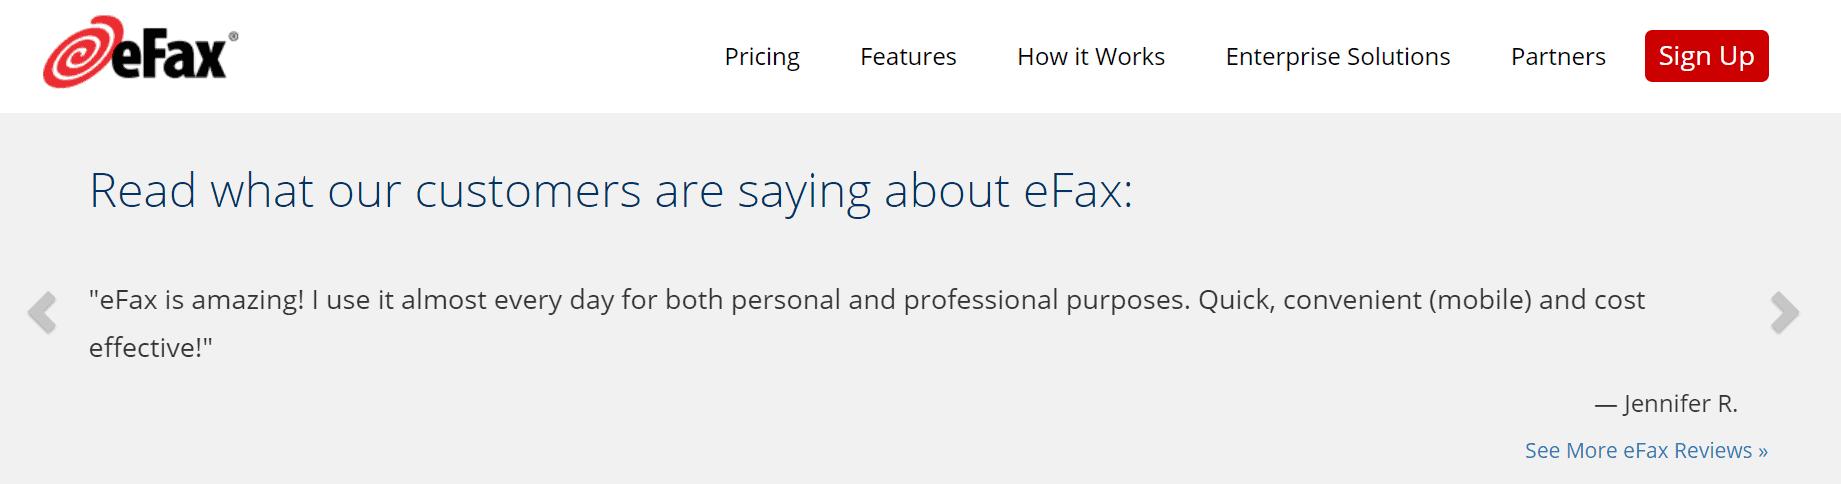 efax customer reviews